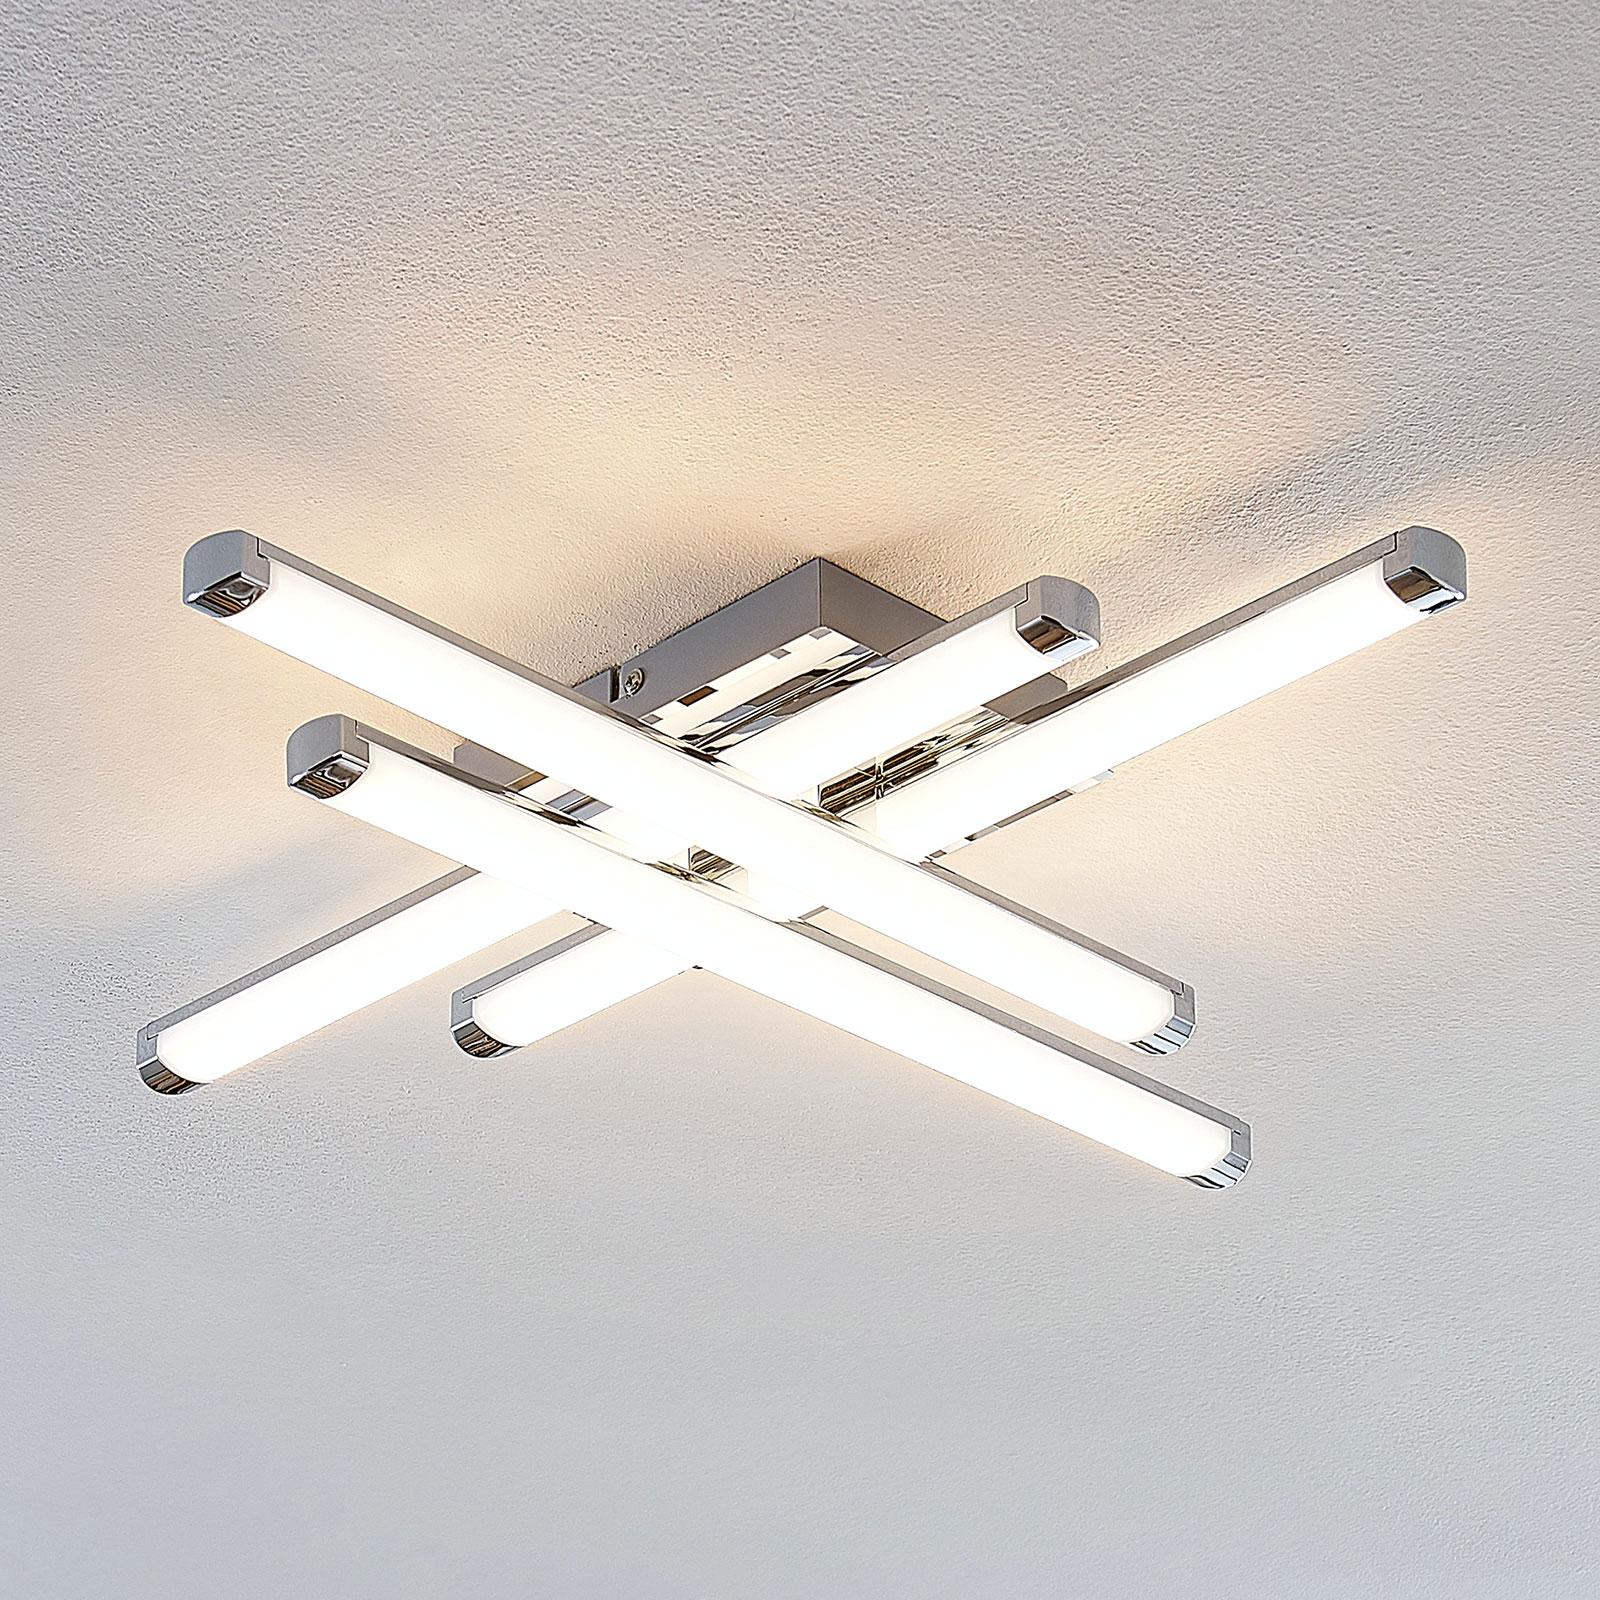 Moderne LED plafondlamp Tilo